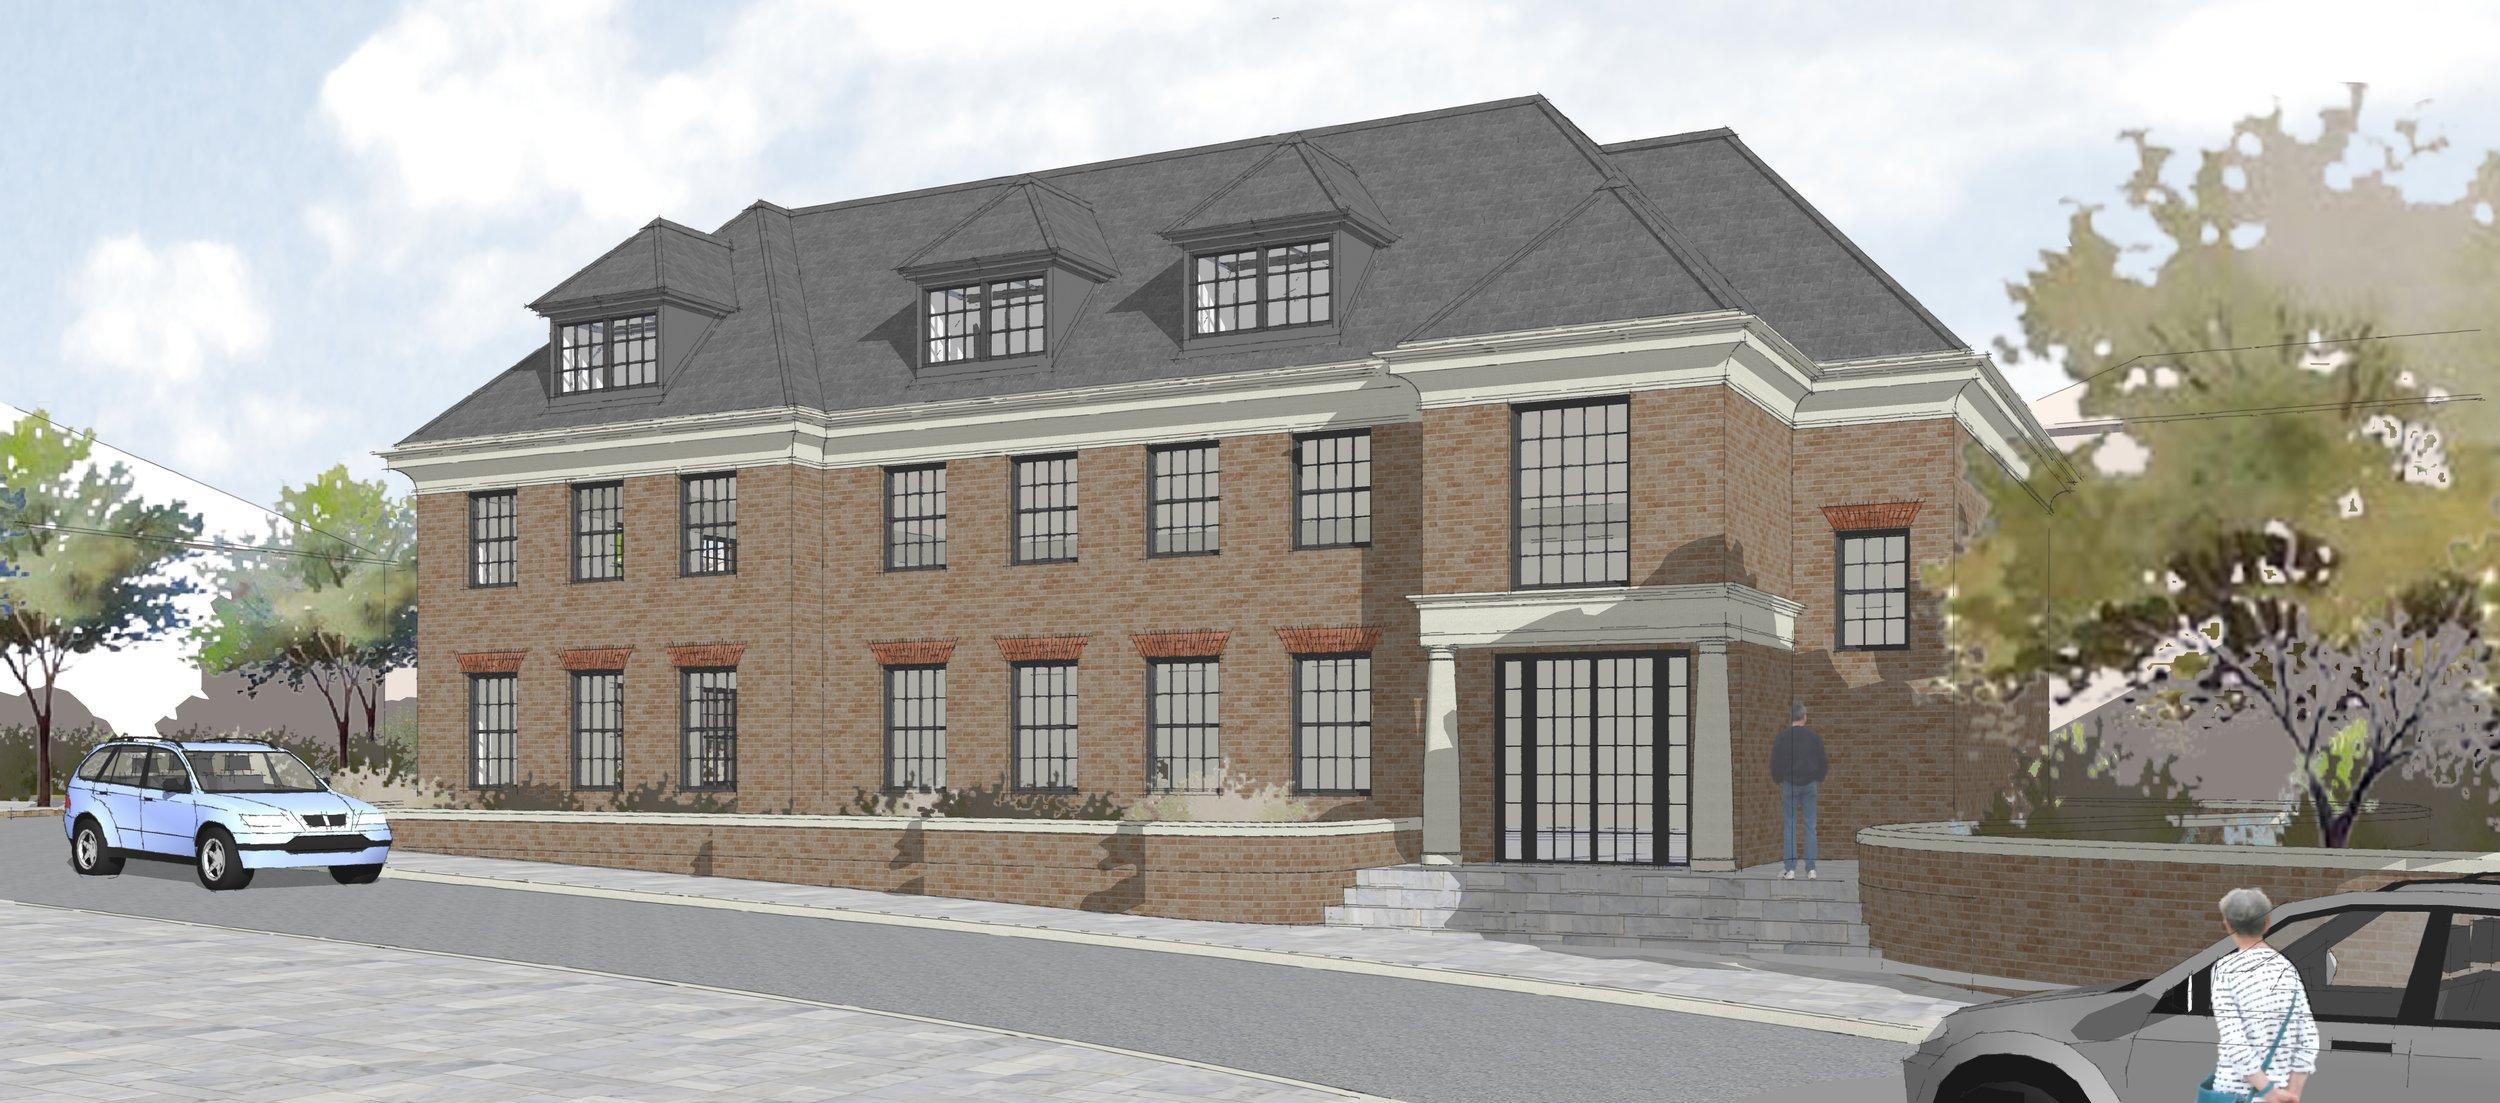 New Office Building, Sevenoaks, Kent